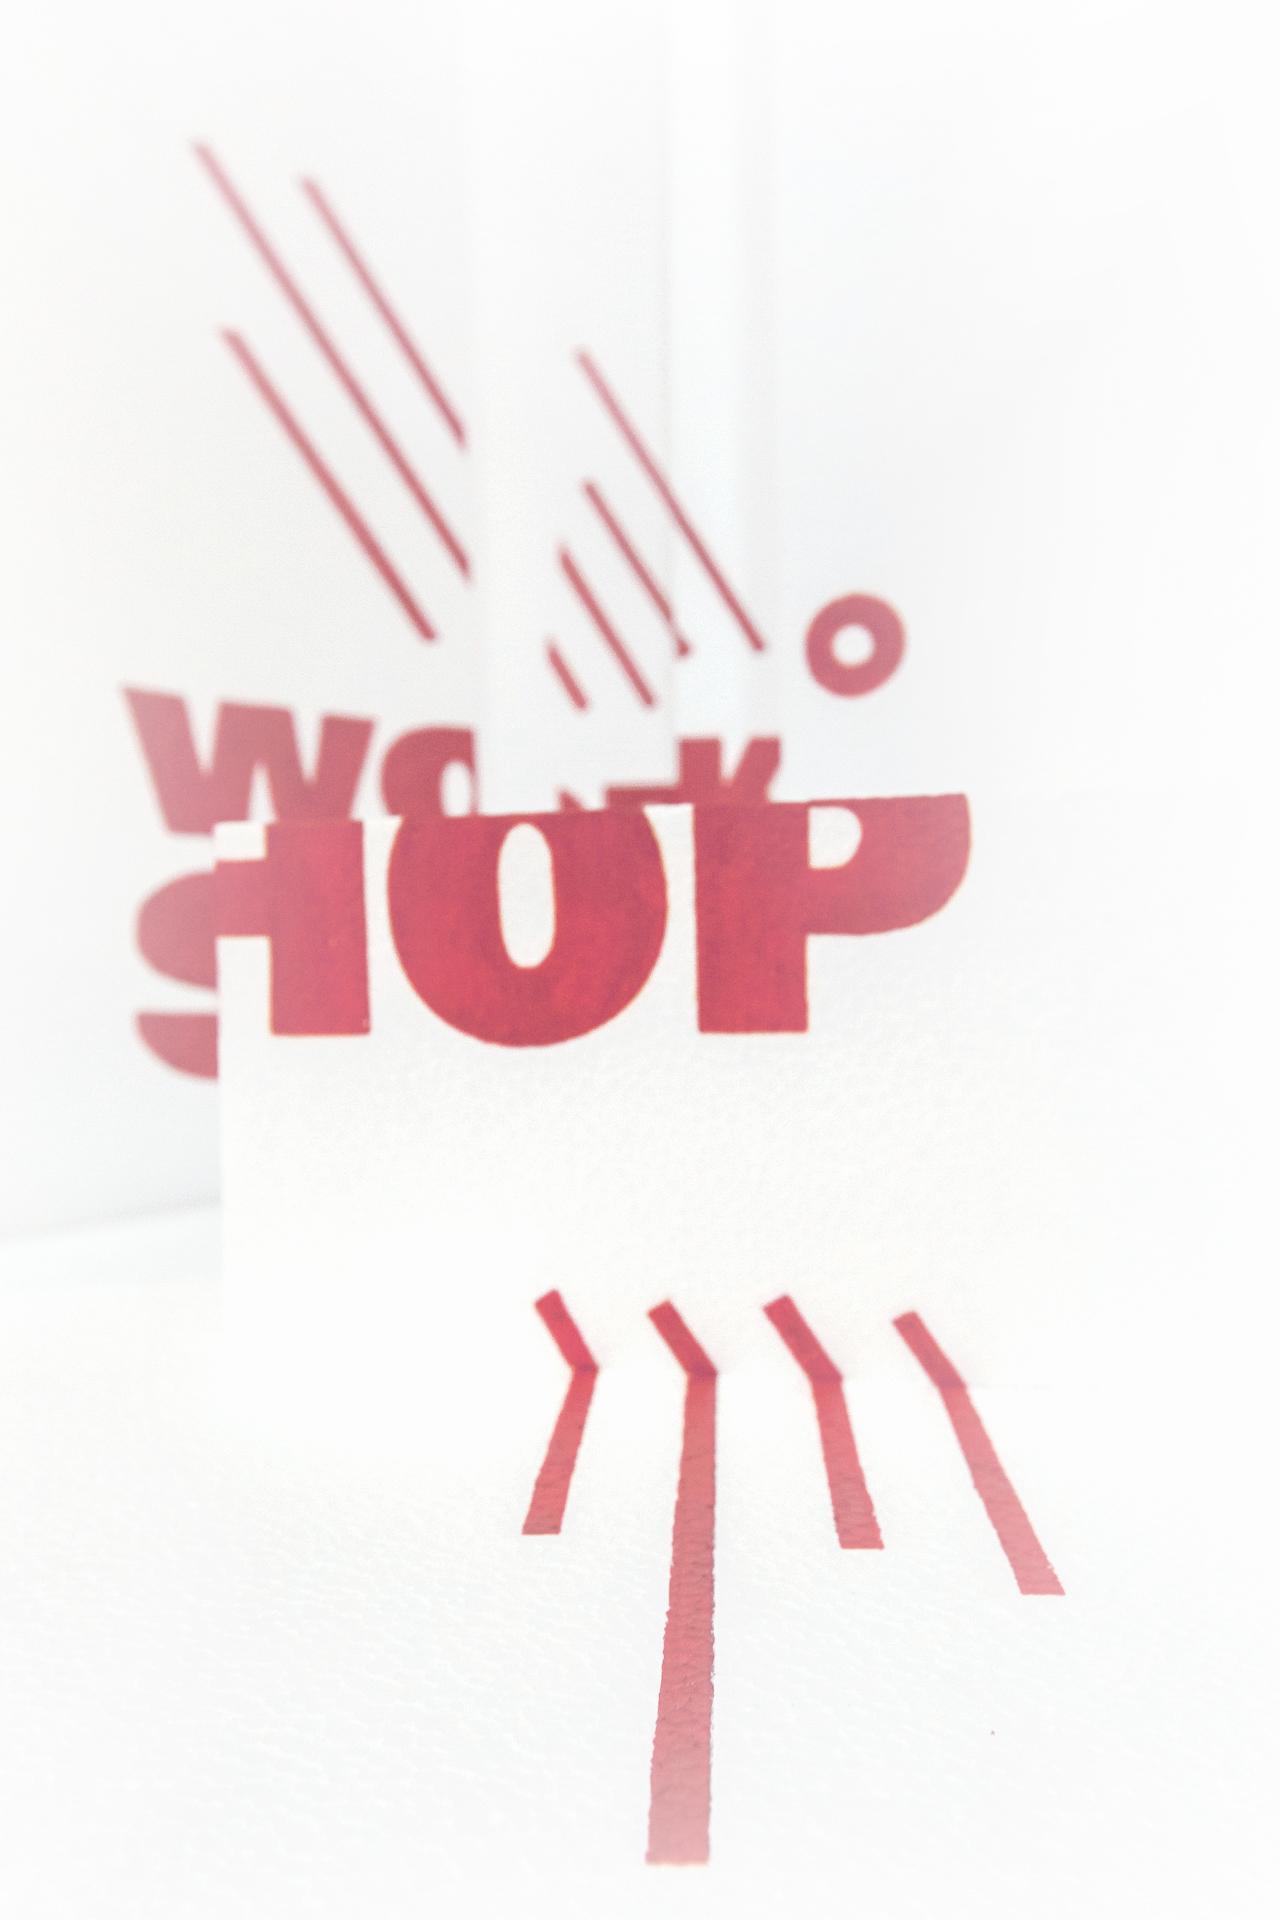 WORKSHOP ESAD BIENAL EXPERIMENTA DESIGN 2015